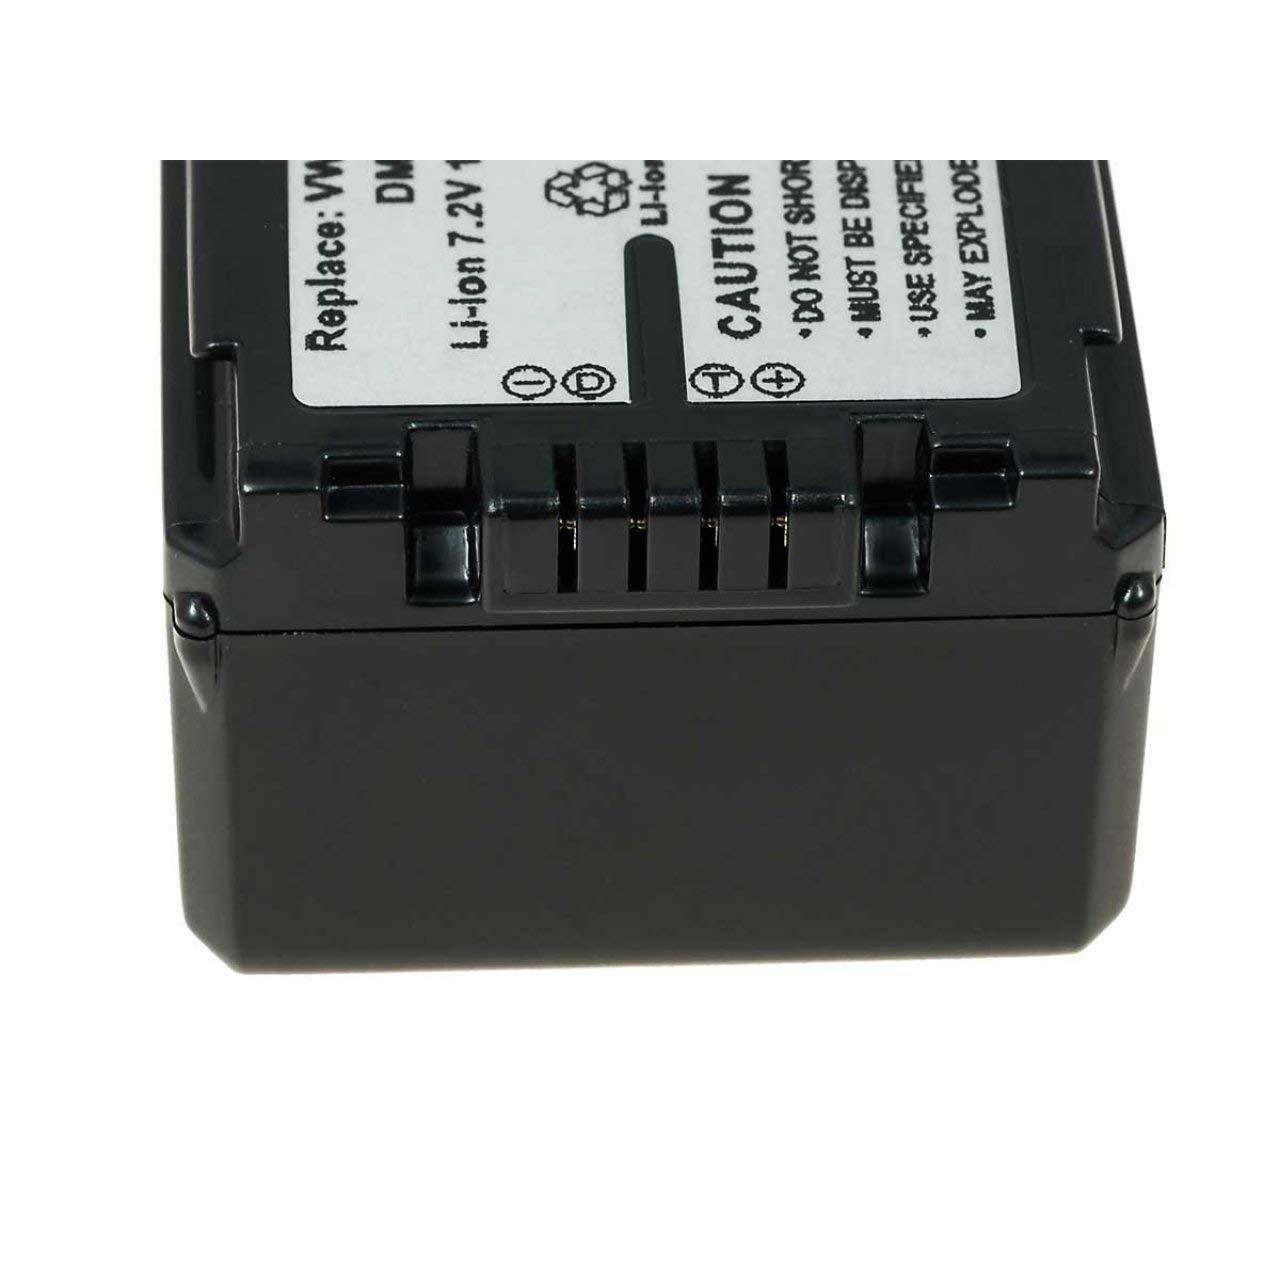 Powery Bater/ía para V/ídeoc/ámara Panasonic HDC-SD700 1320mAh